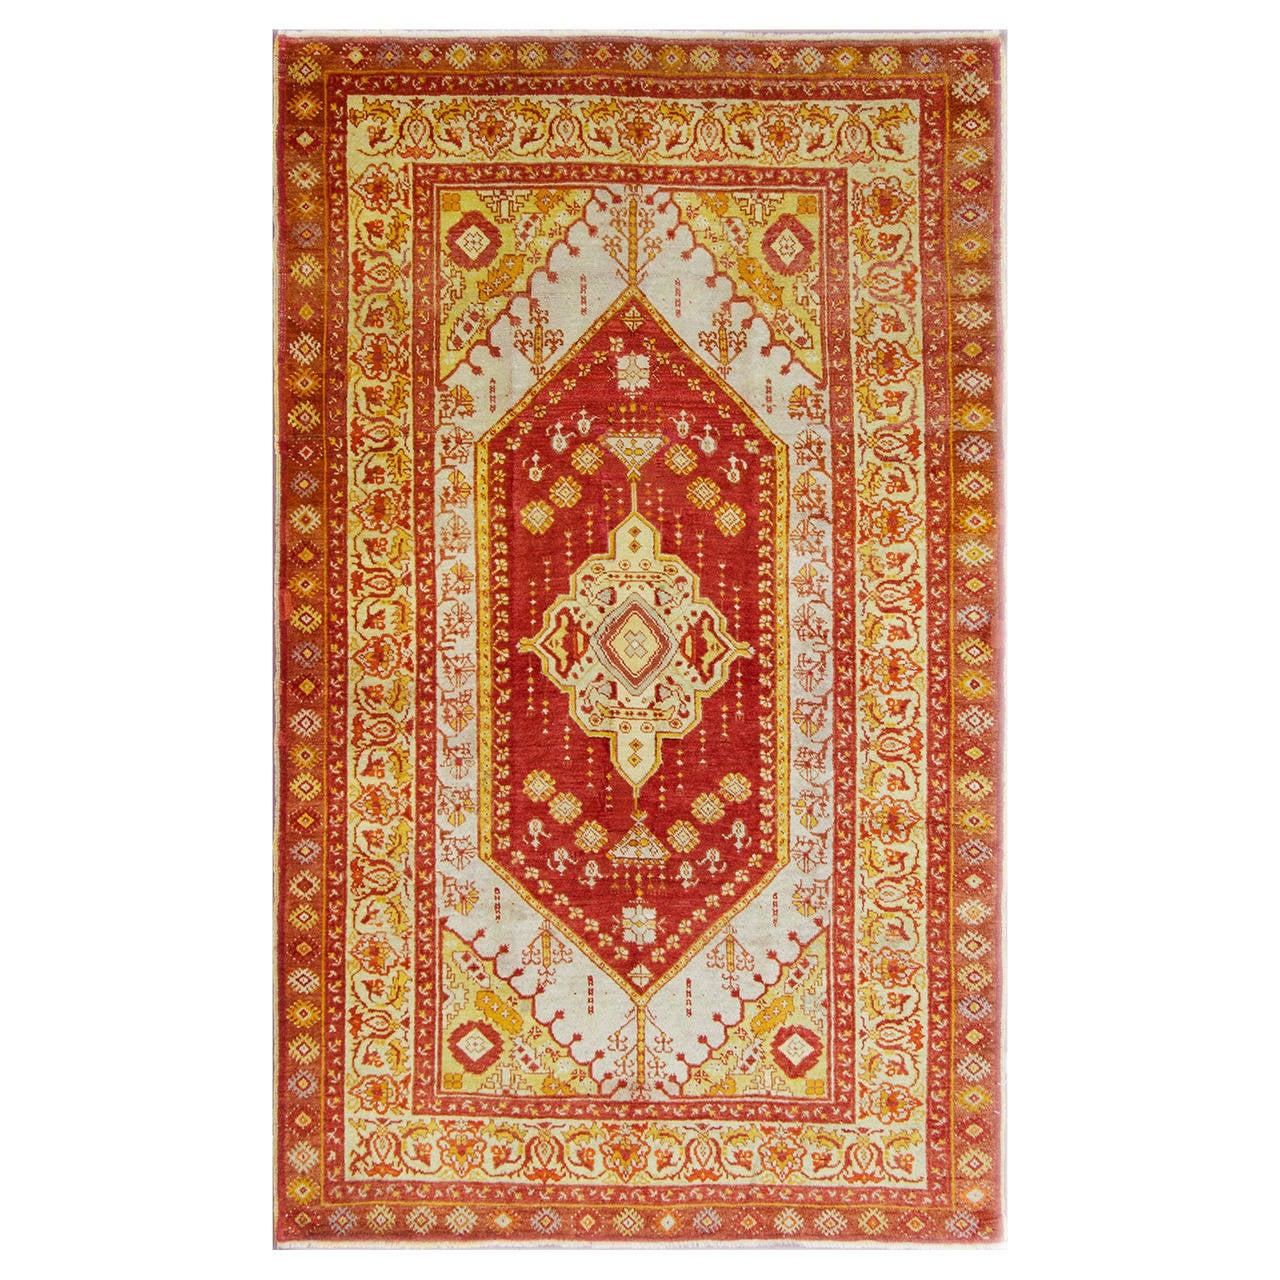 "Oushak Rugs For Sale: 4'3"" X 7'2"" Turkish Oushak Anatolian Rug For Sale At 1stdibs"